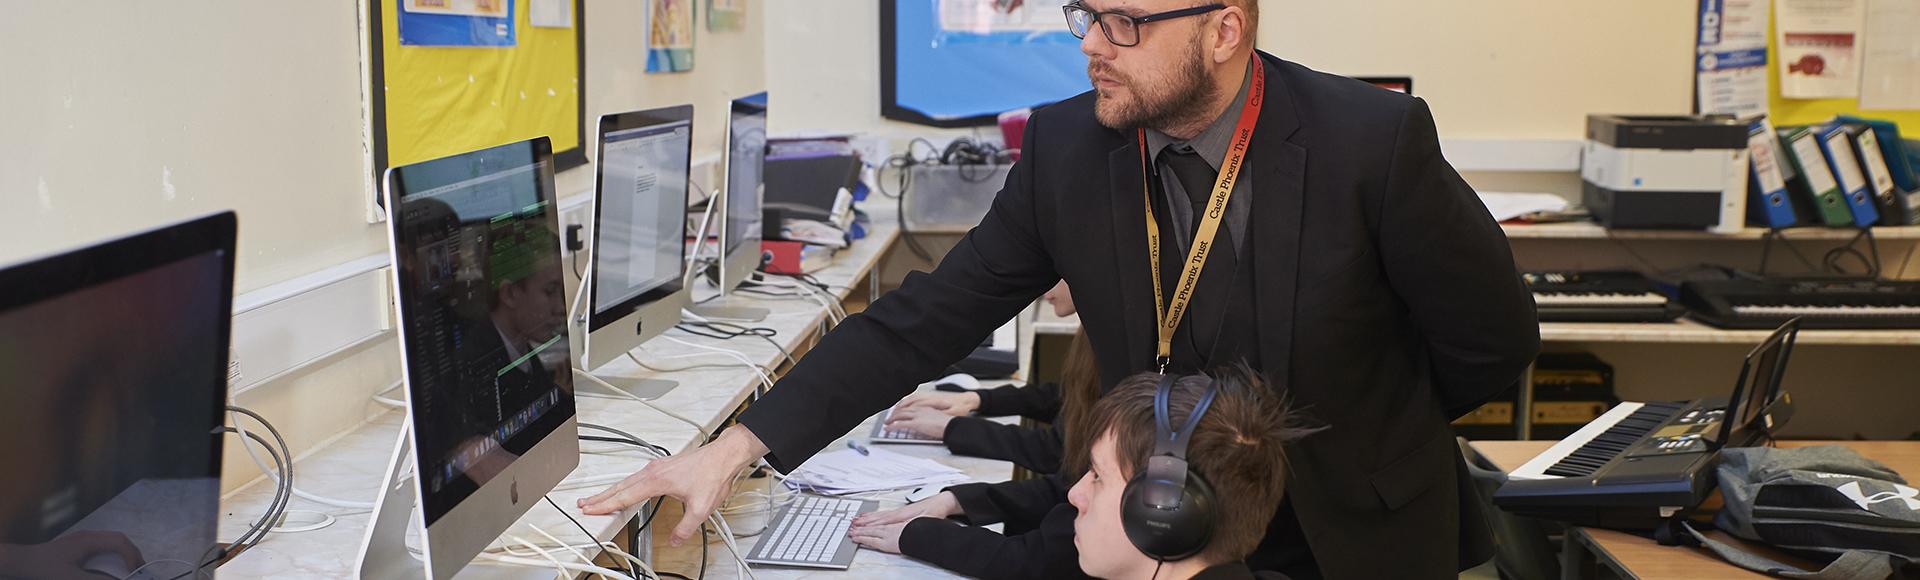 SCHOOL OPEN FOR KEY WORKERS